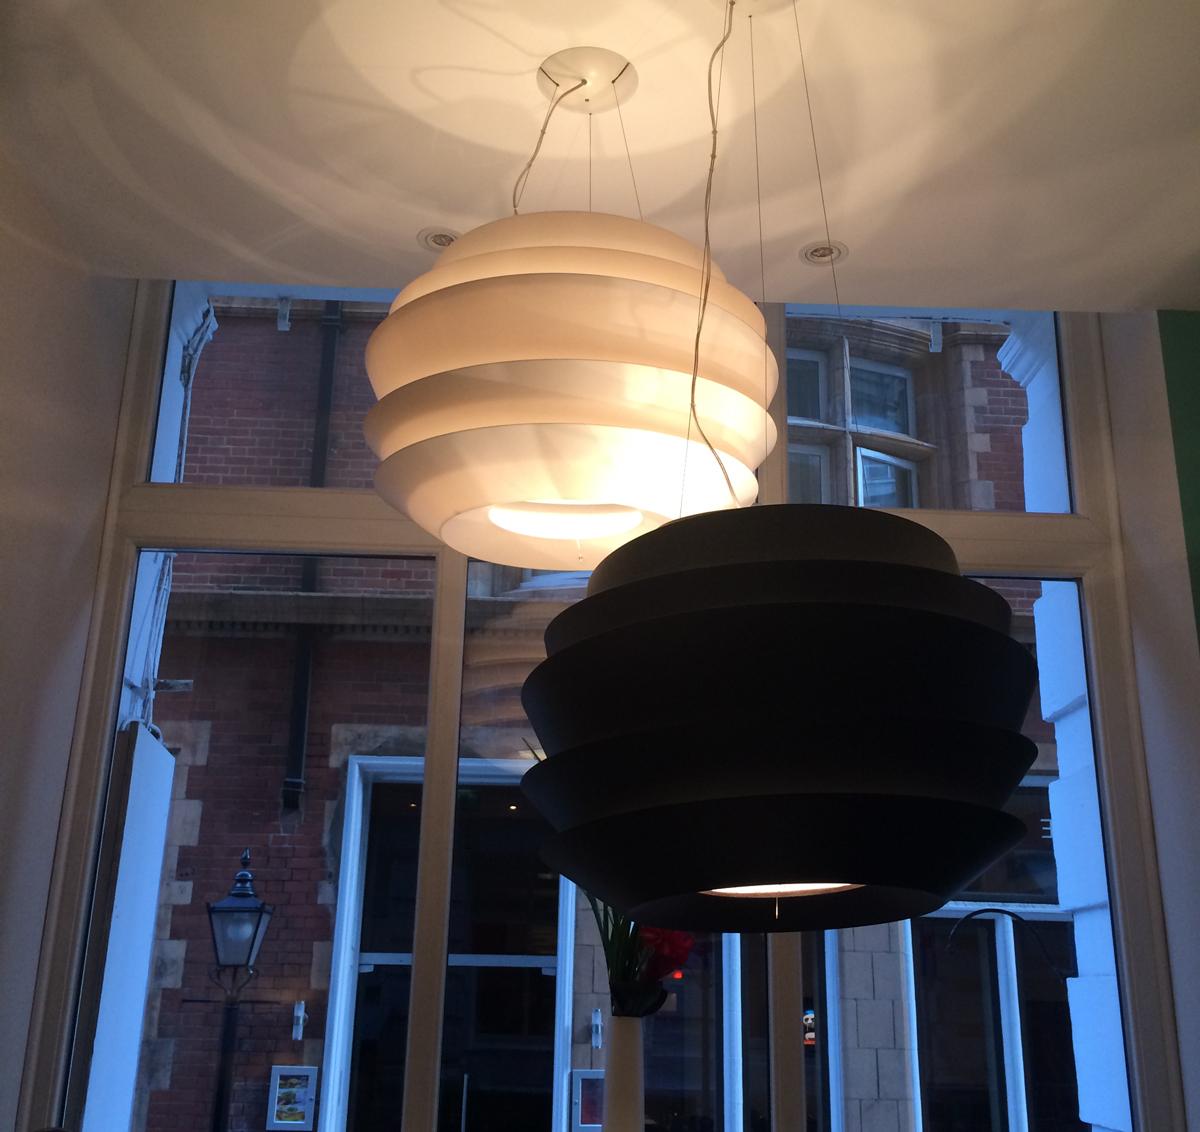 Foscarini Le Soleil — Light My Nest